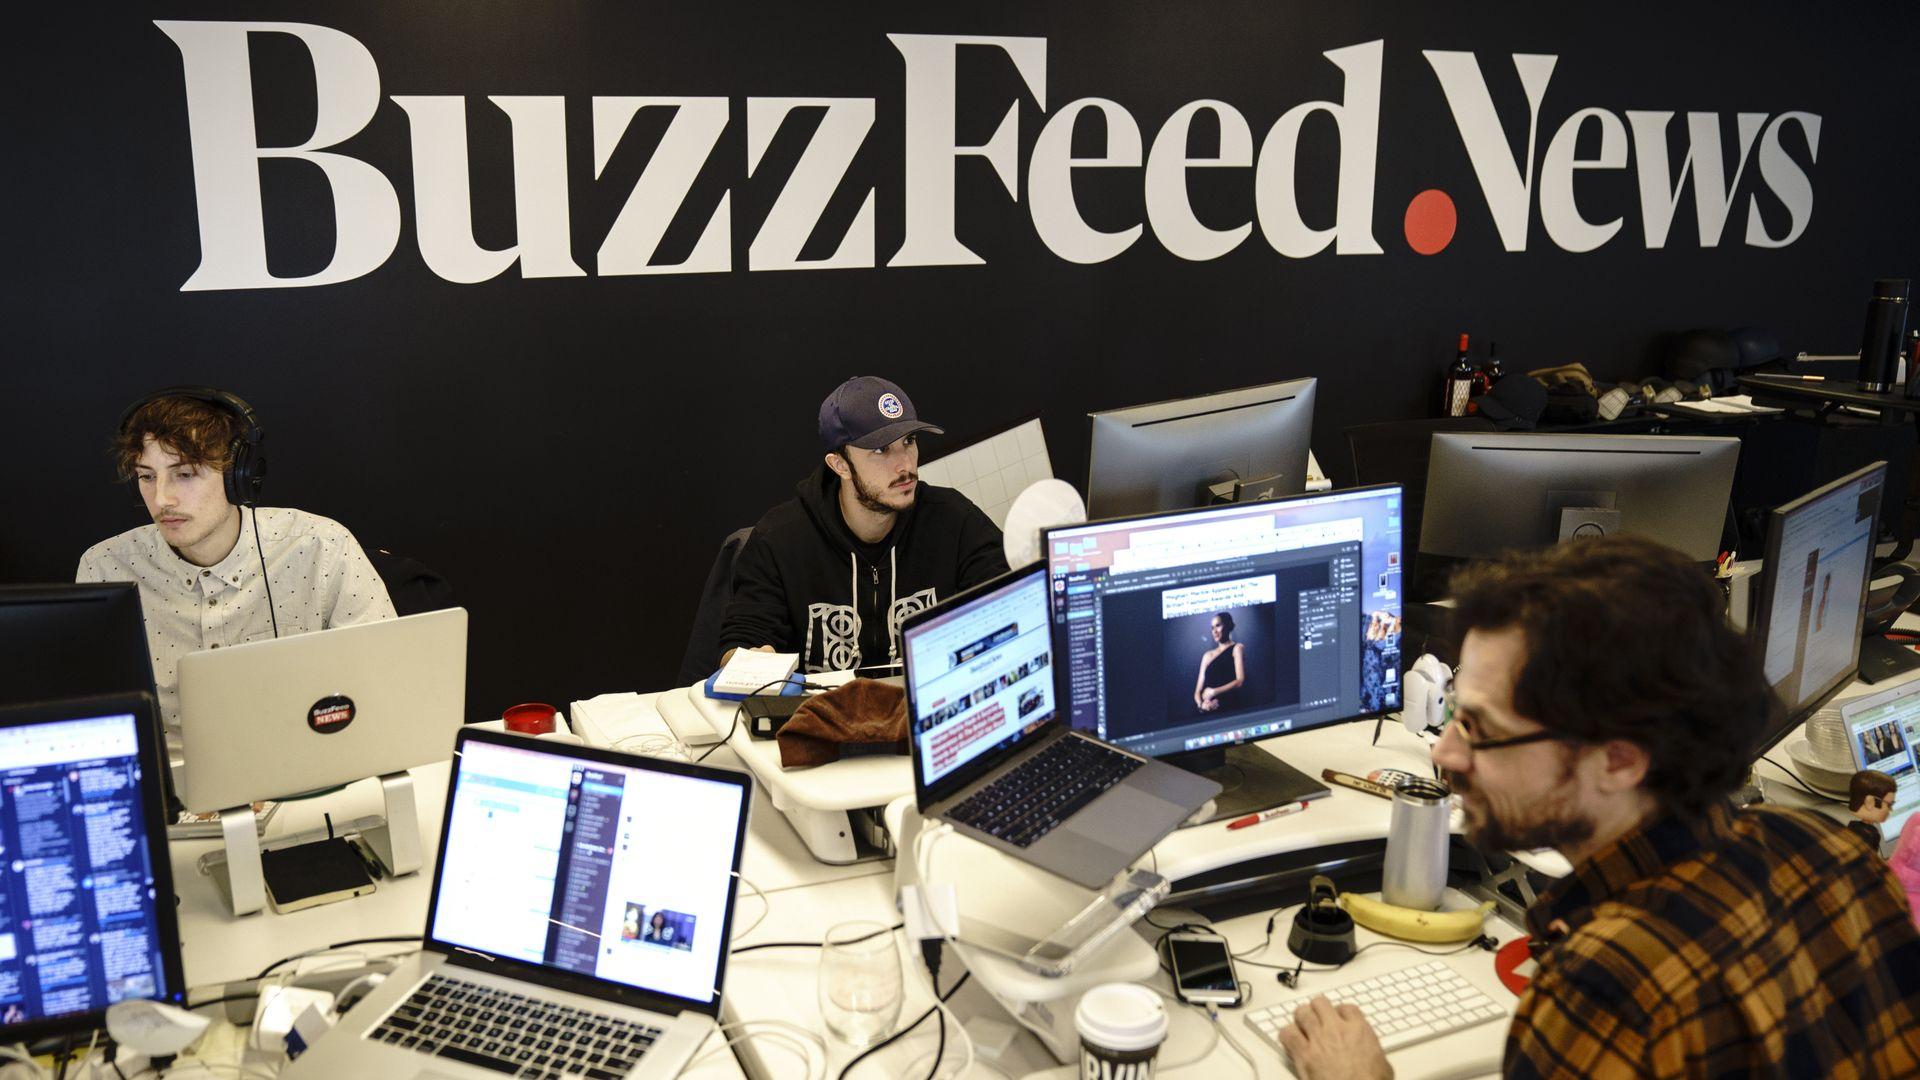 BuzzFeed reverses course after PTO backlash - Axios